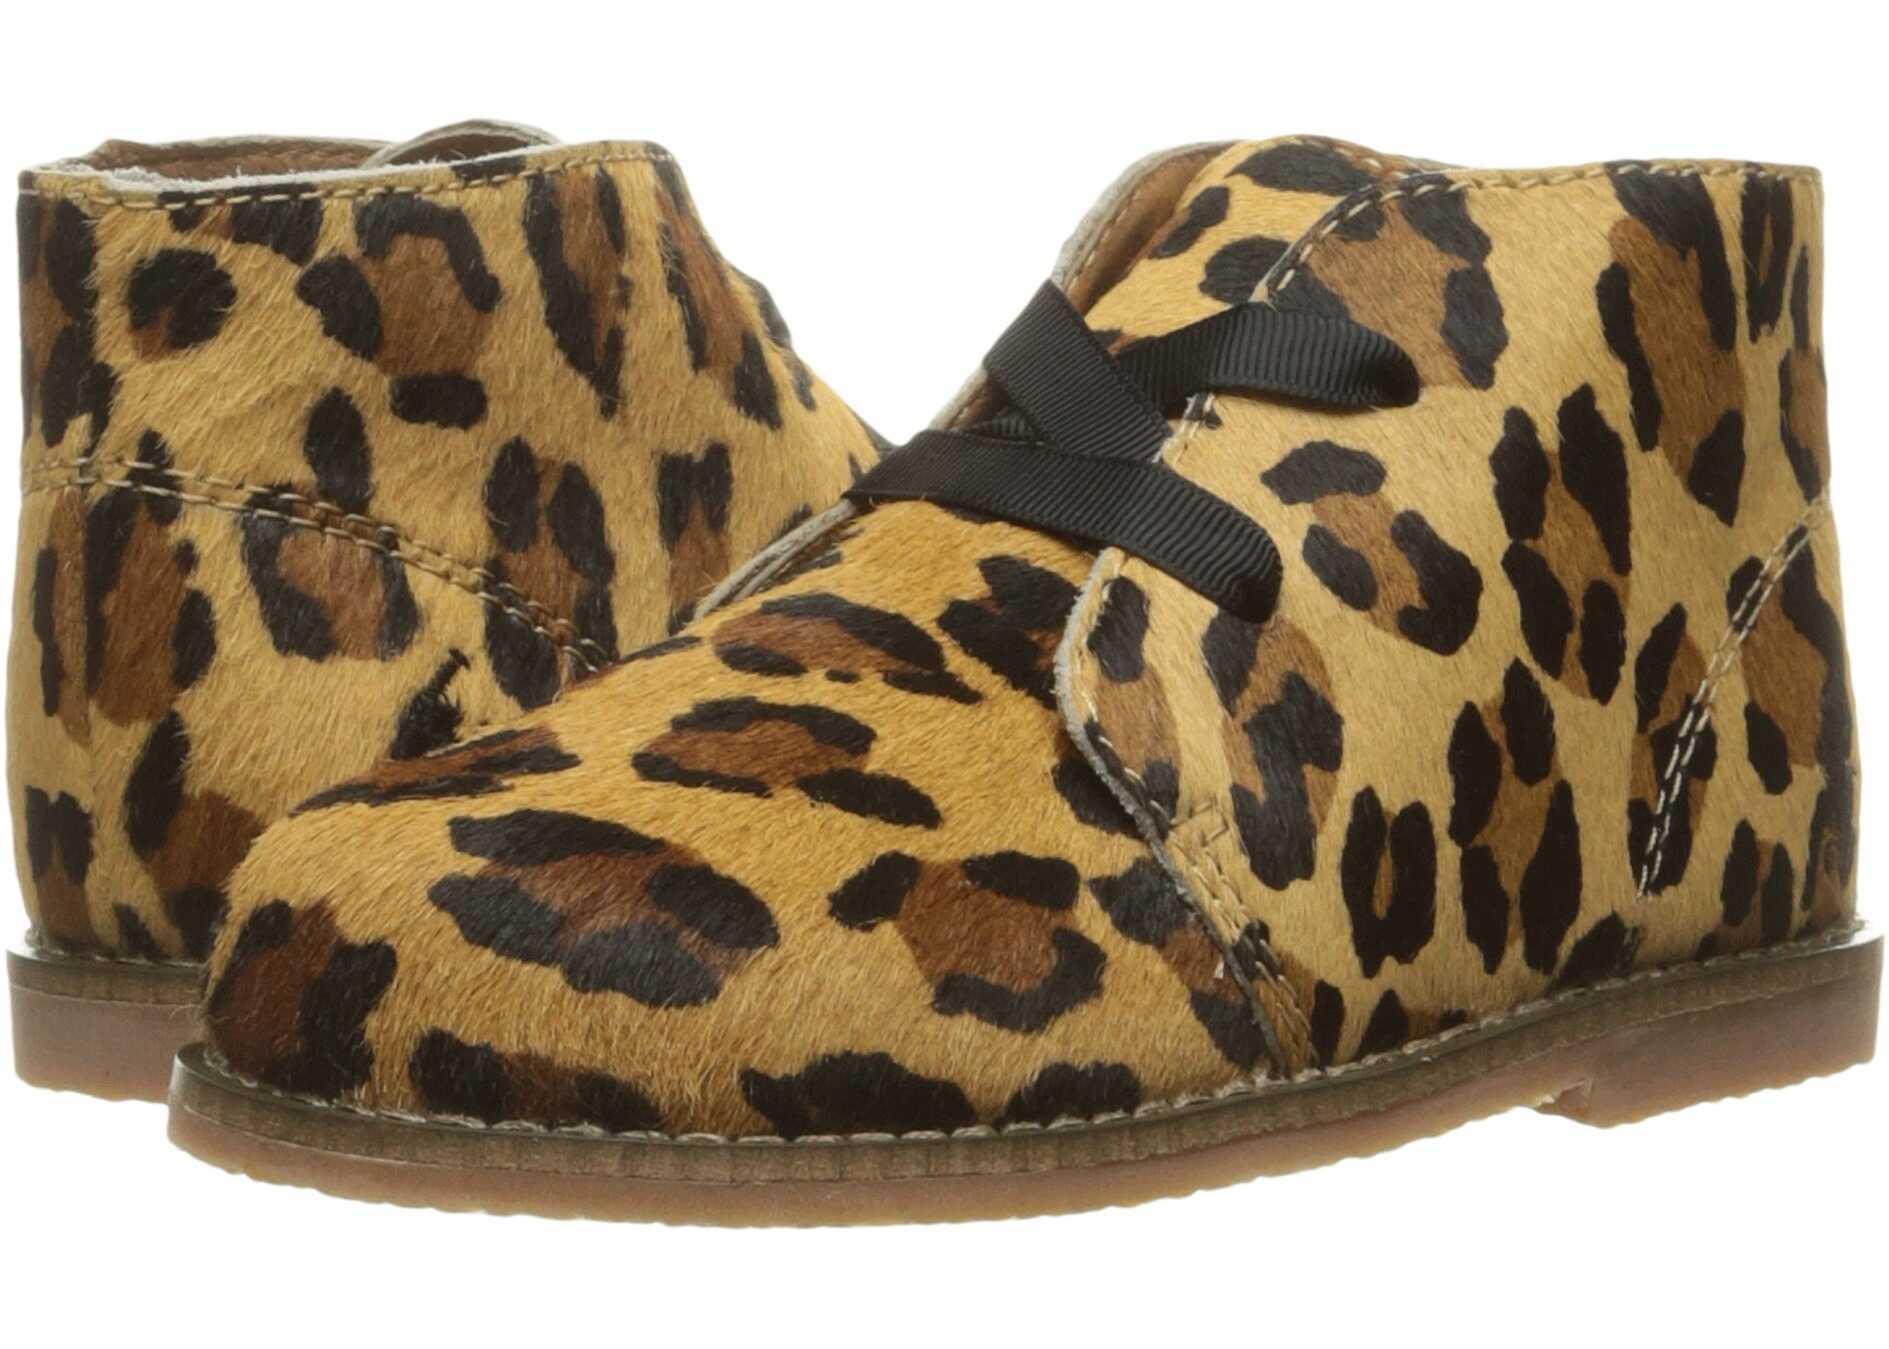 Polo Ralph Lauren Kids Carl (Infant/Toddler) Leopard Haircalf